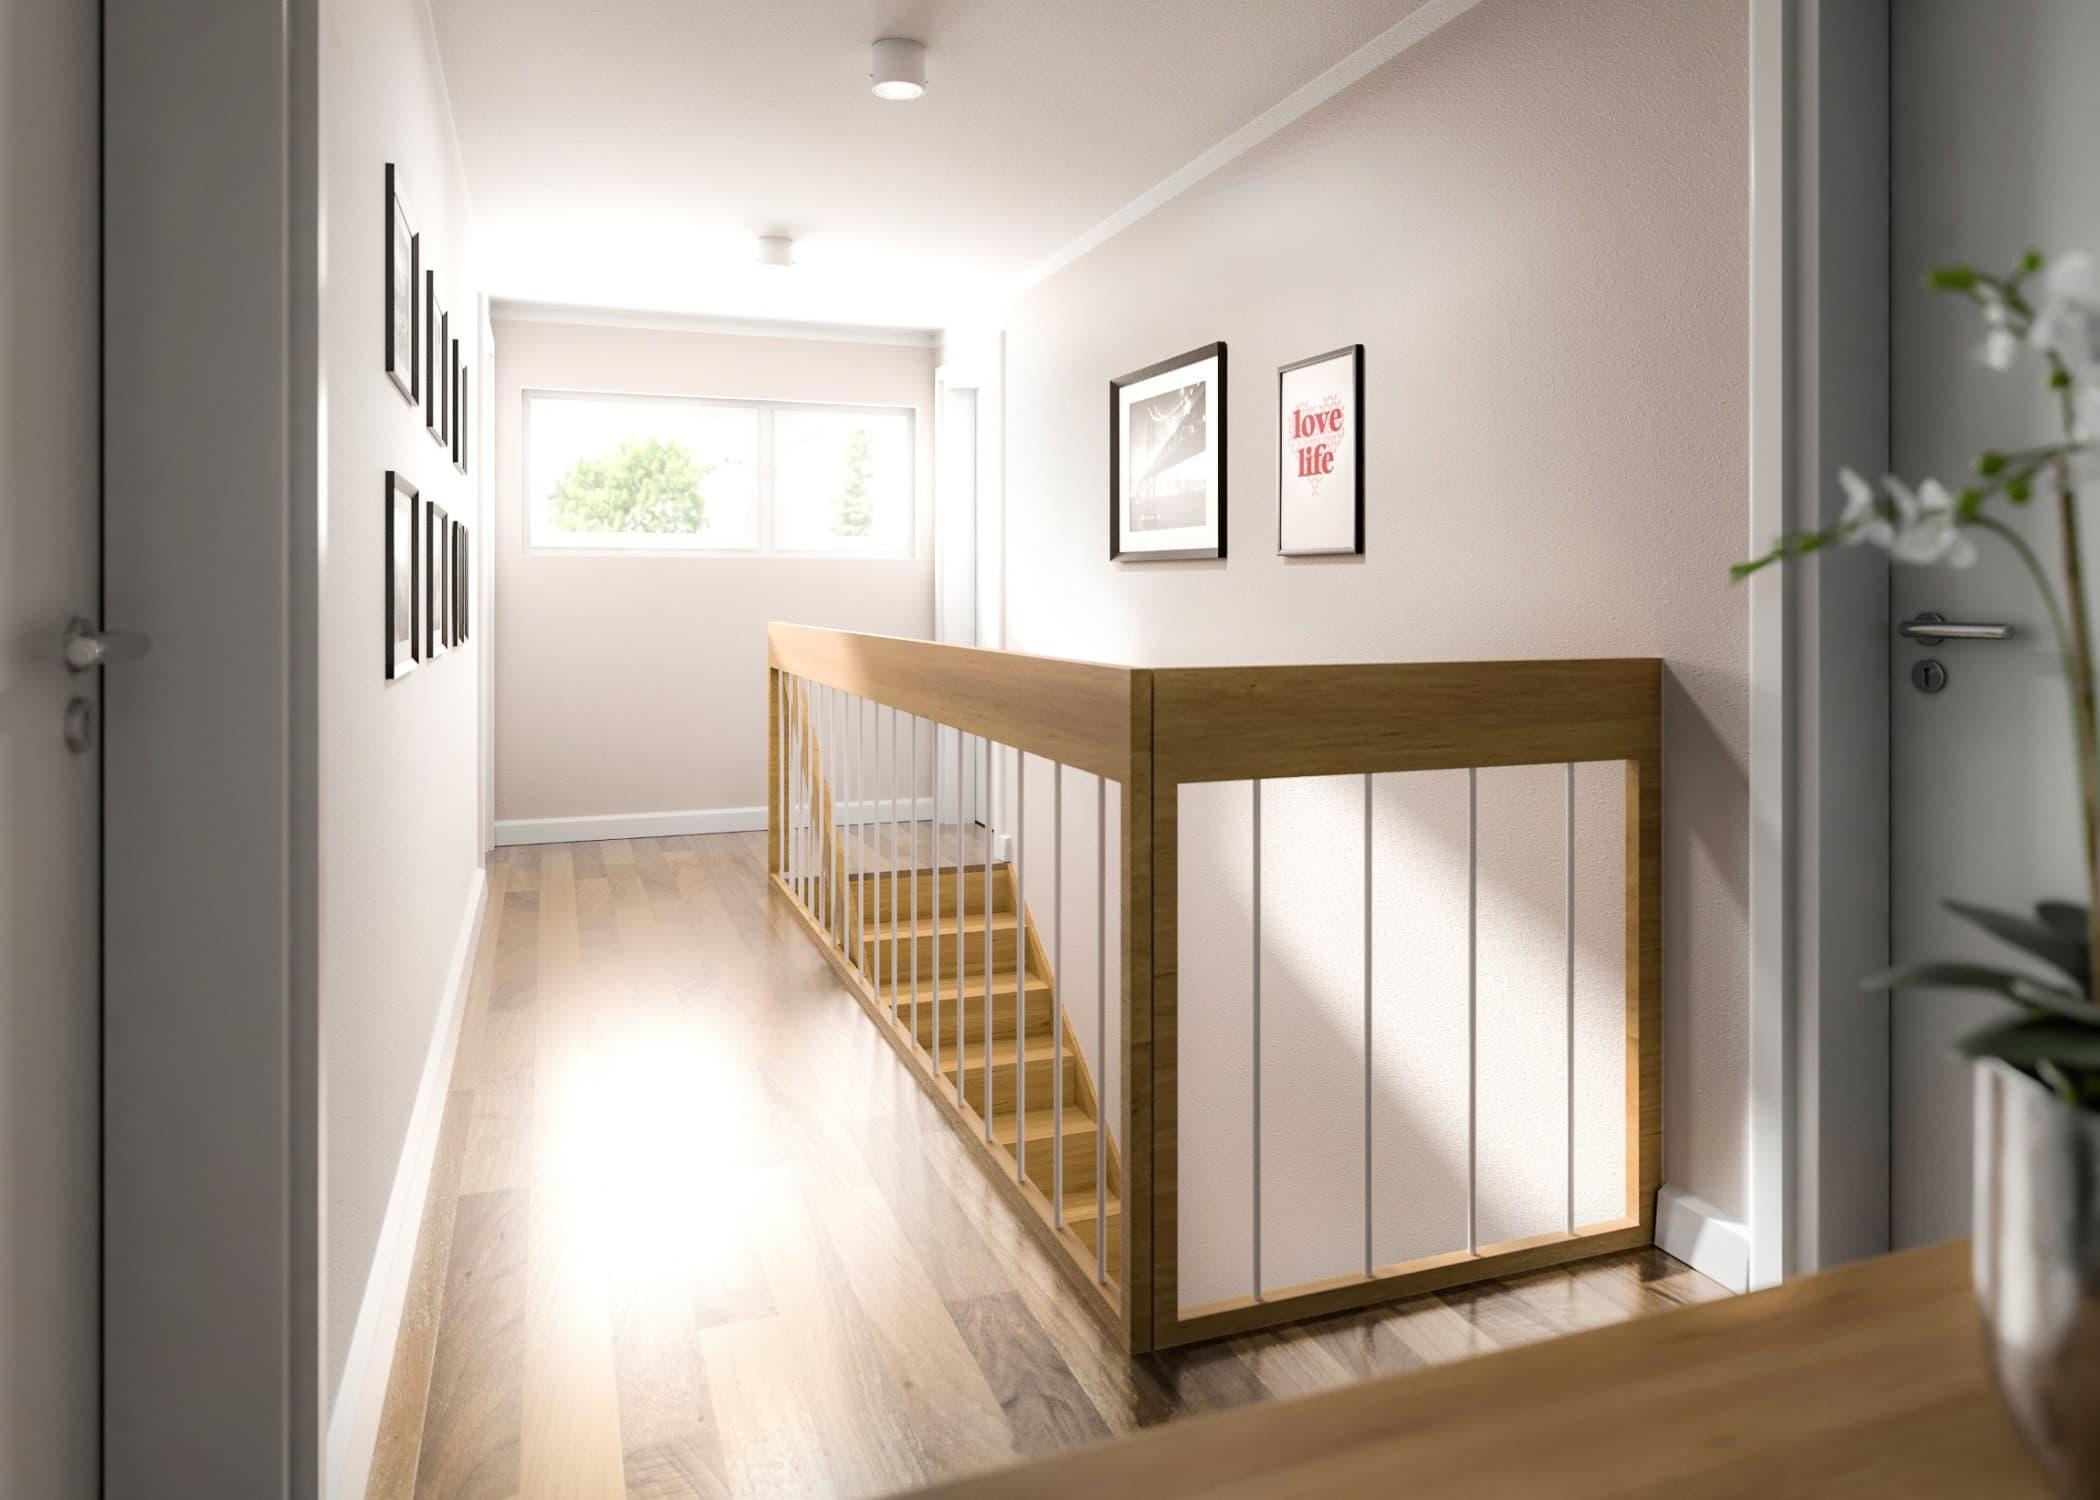 Flur Obergeschoss mit Treppe - Ideen Inneneinrichtung Doppelhaus AURA 136 von Town Country Haus - HausbauDirekt.de